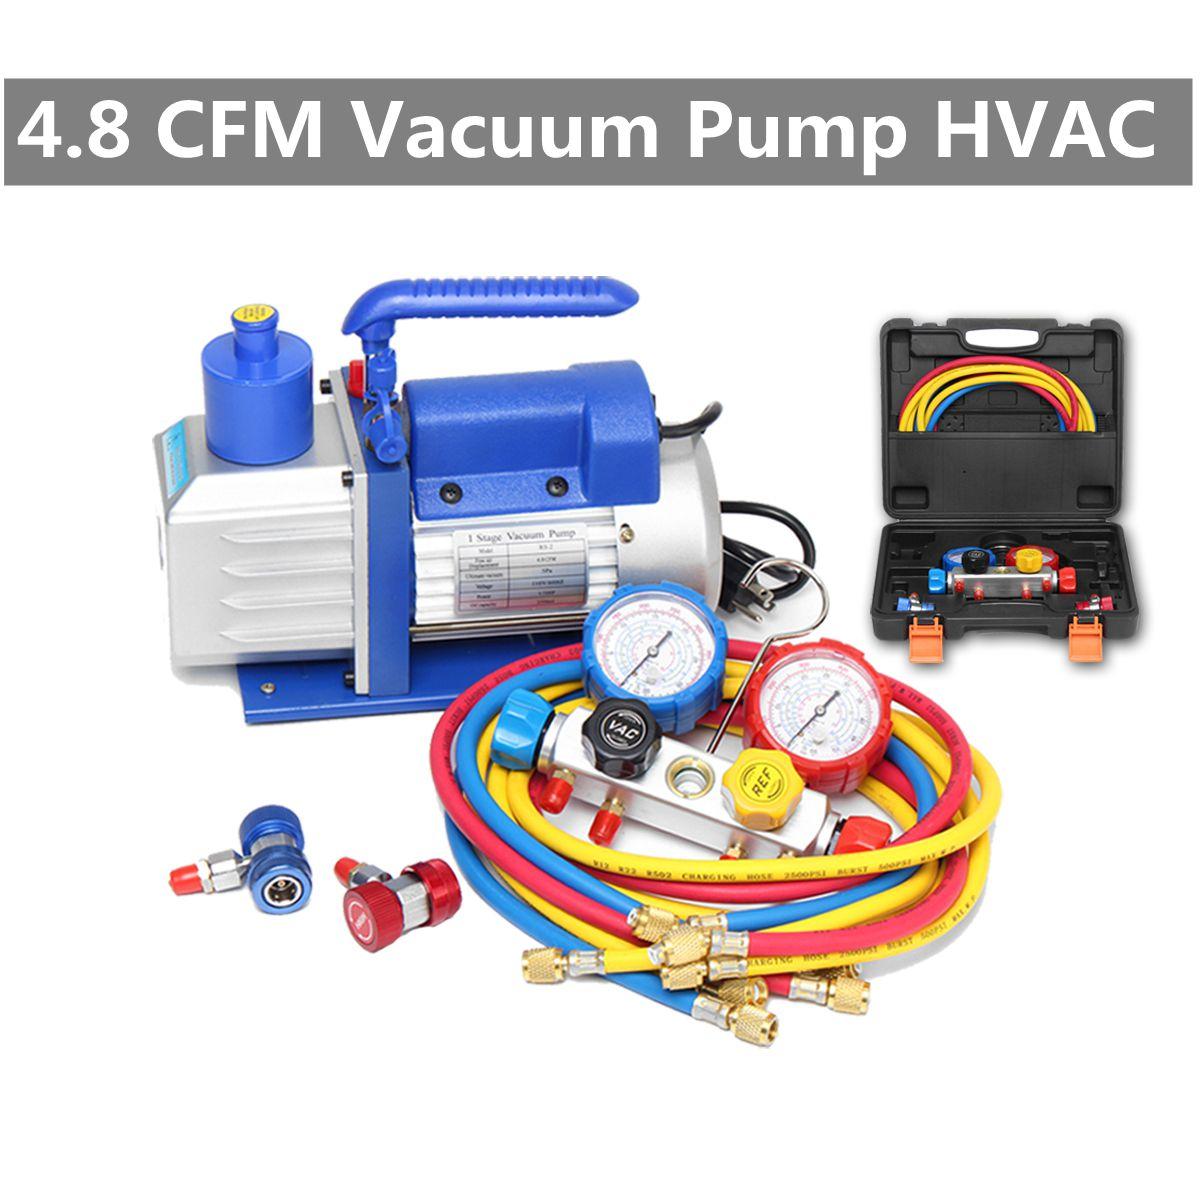 4 8CFM Vacuum Pump R134A R22 R410A HVA C Refrigerant W 4VALVE MANIFOLD GAUGE Pumps Parts